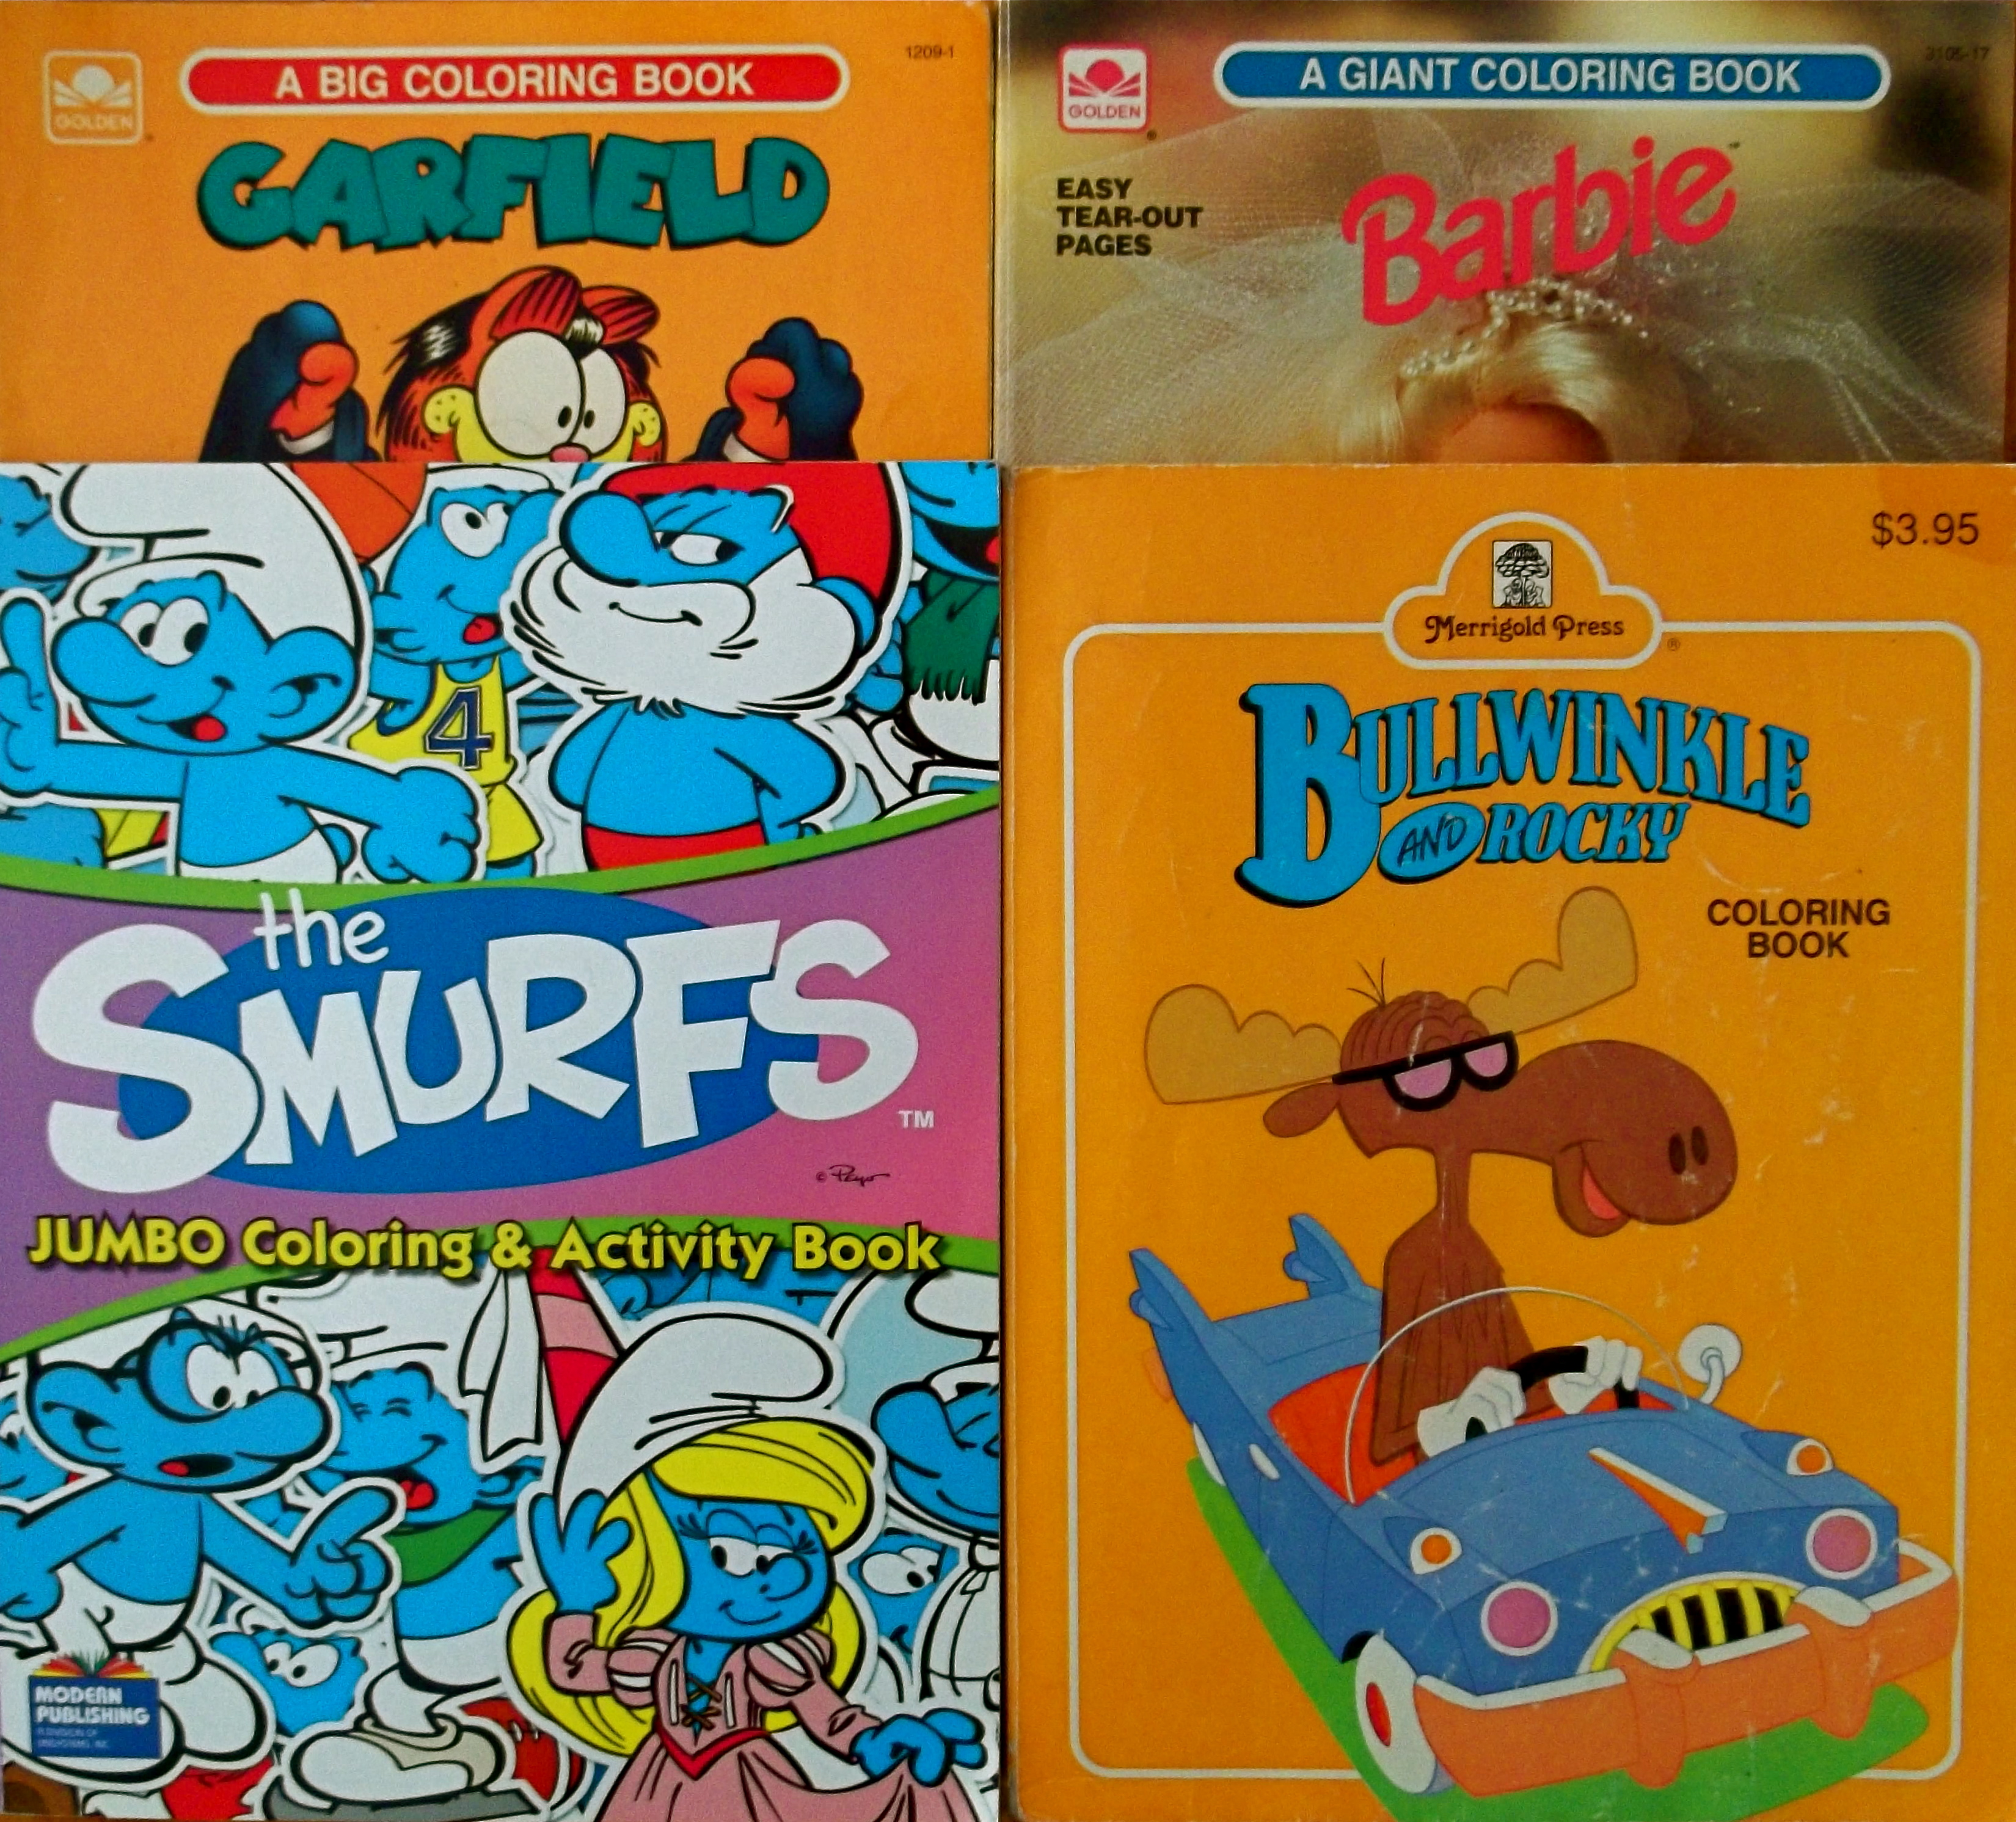 garfield - Big Coloring Books